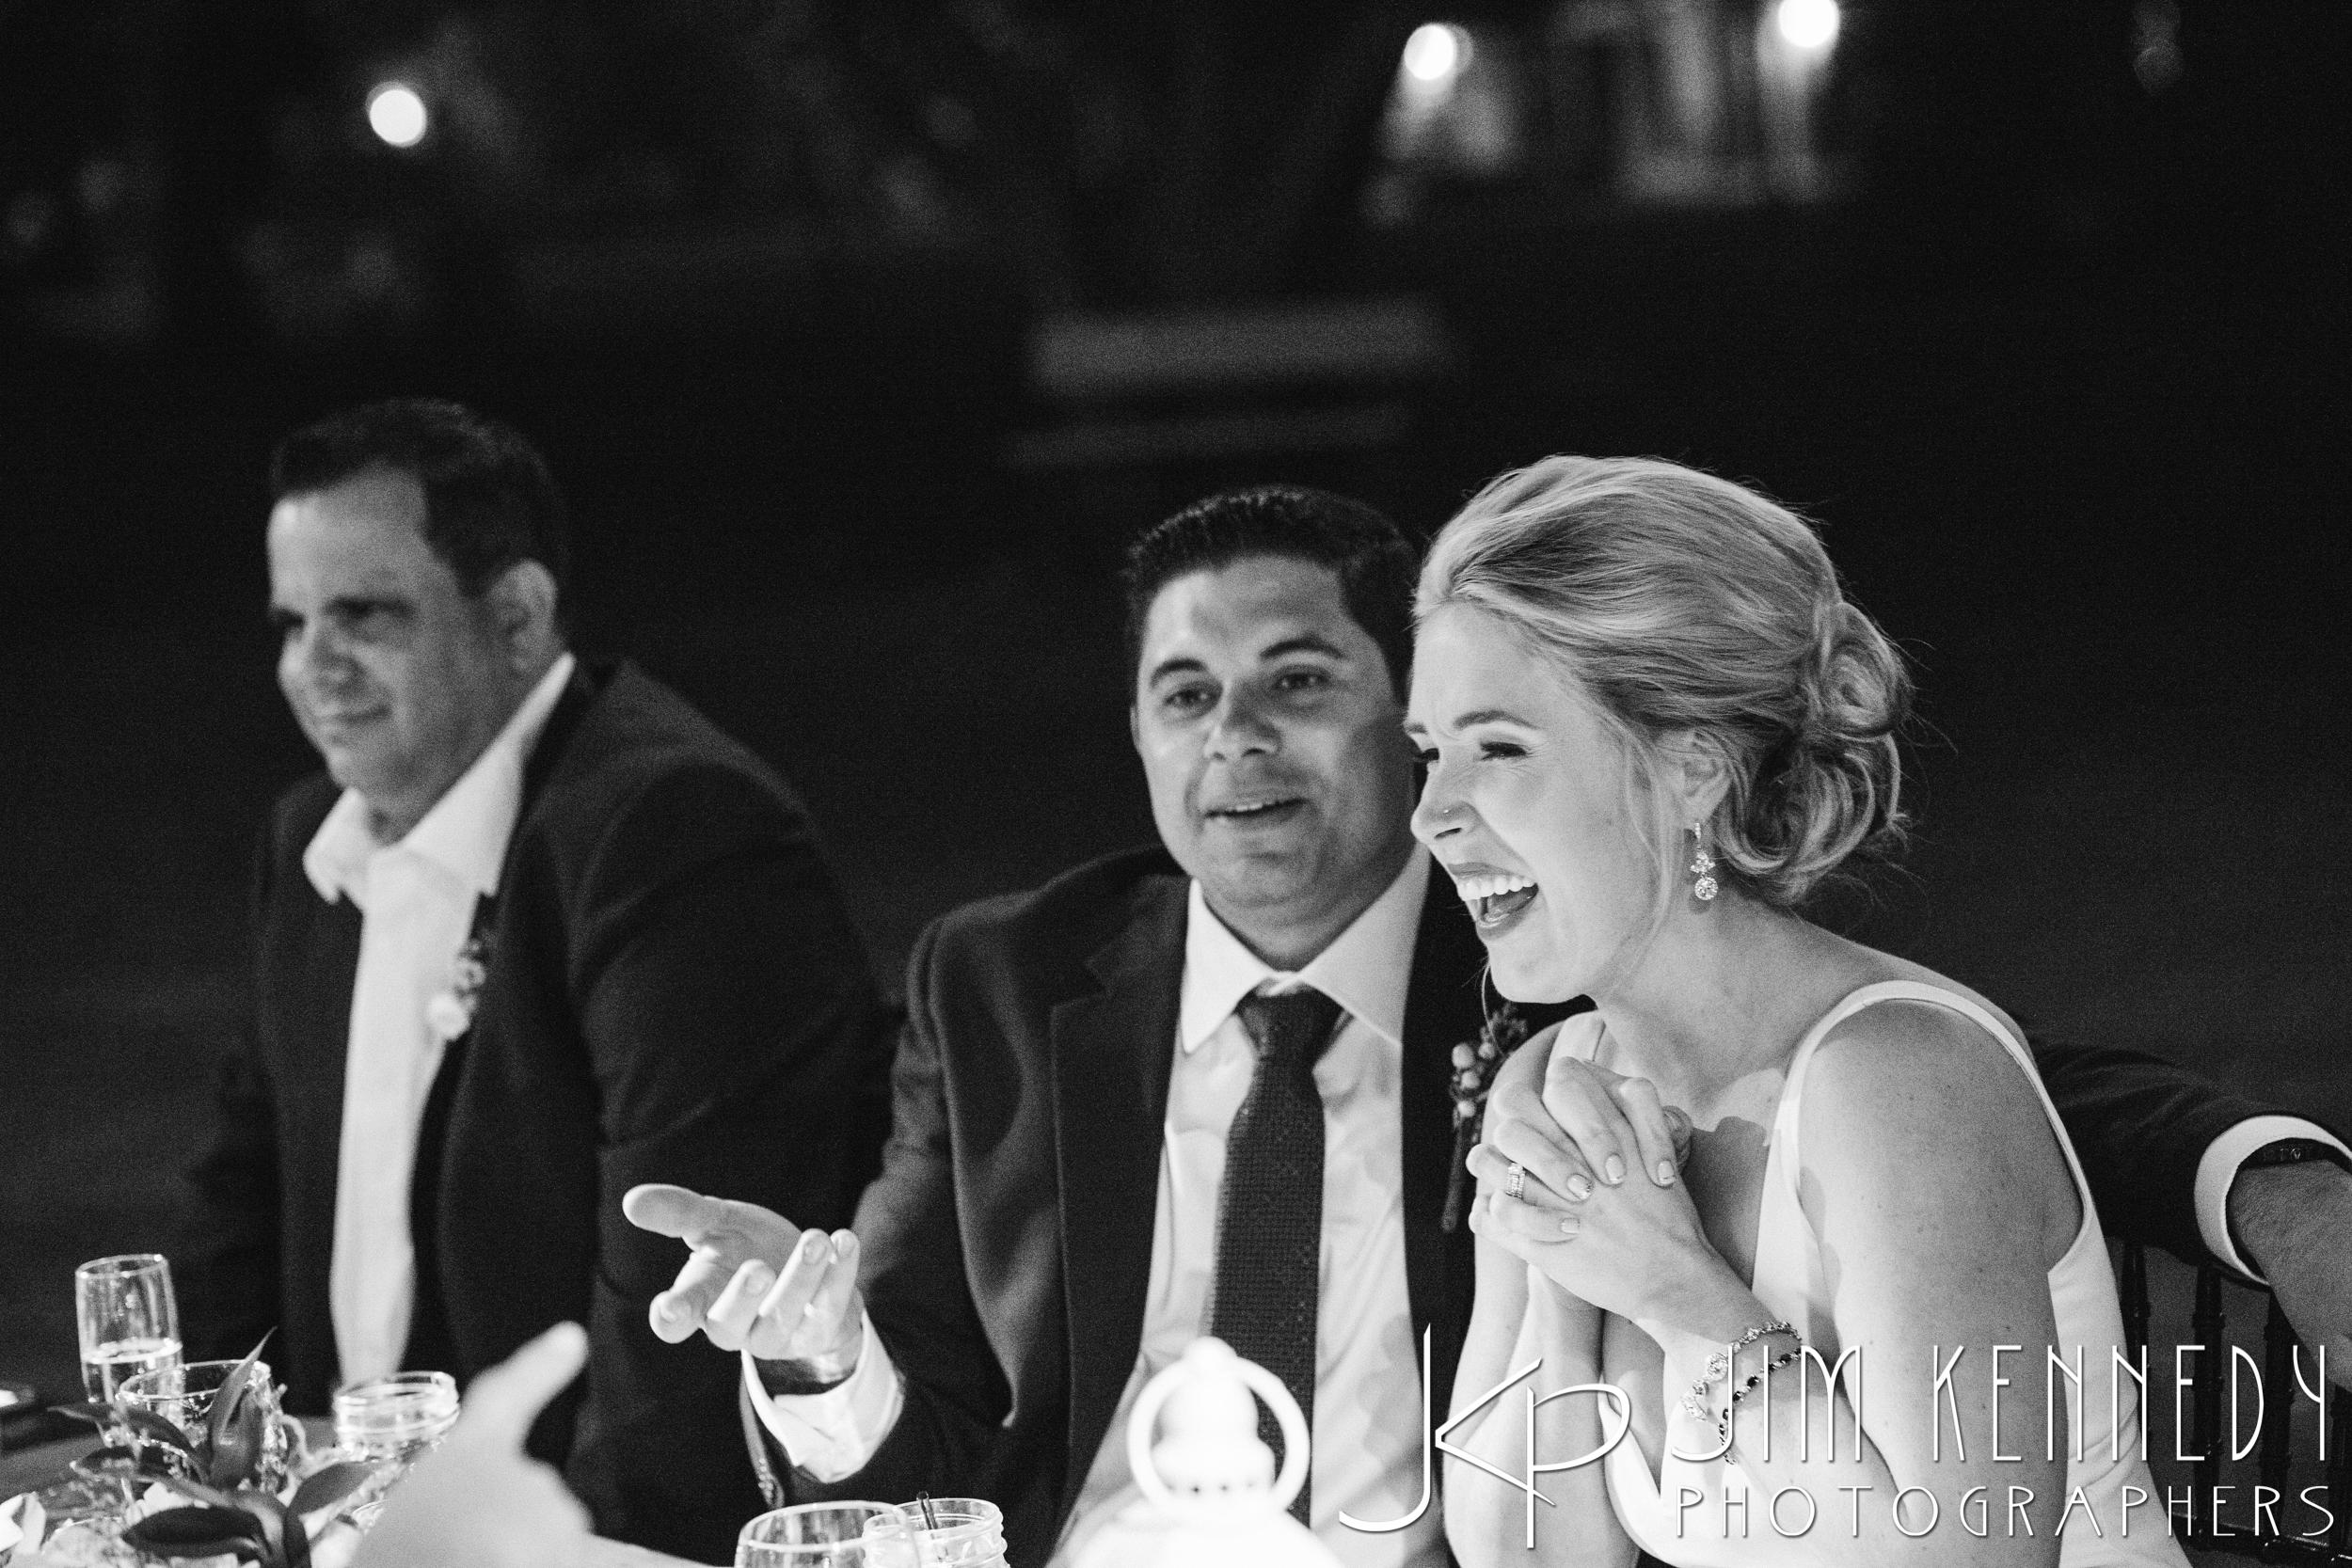 jim_kennedy_photographers_highland_springs_wedding_caitlyn_0193.jpg